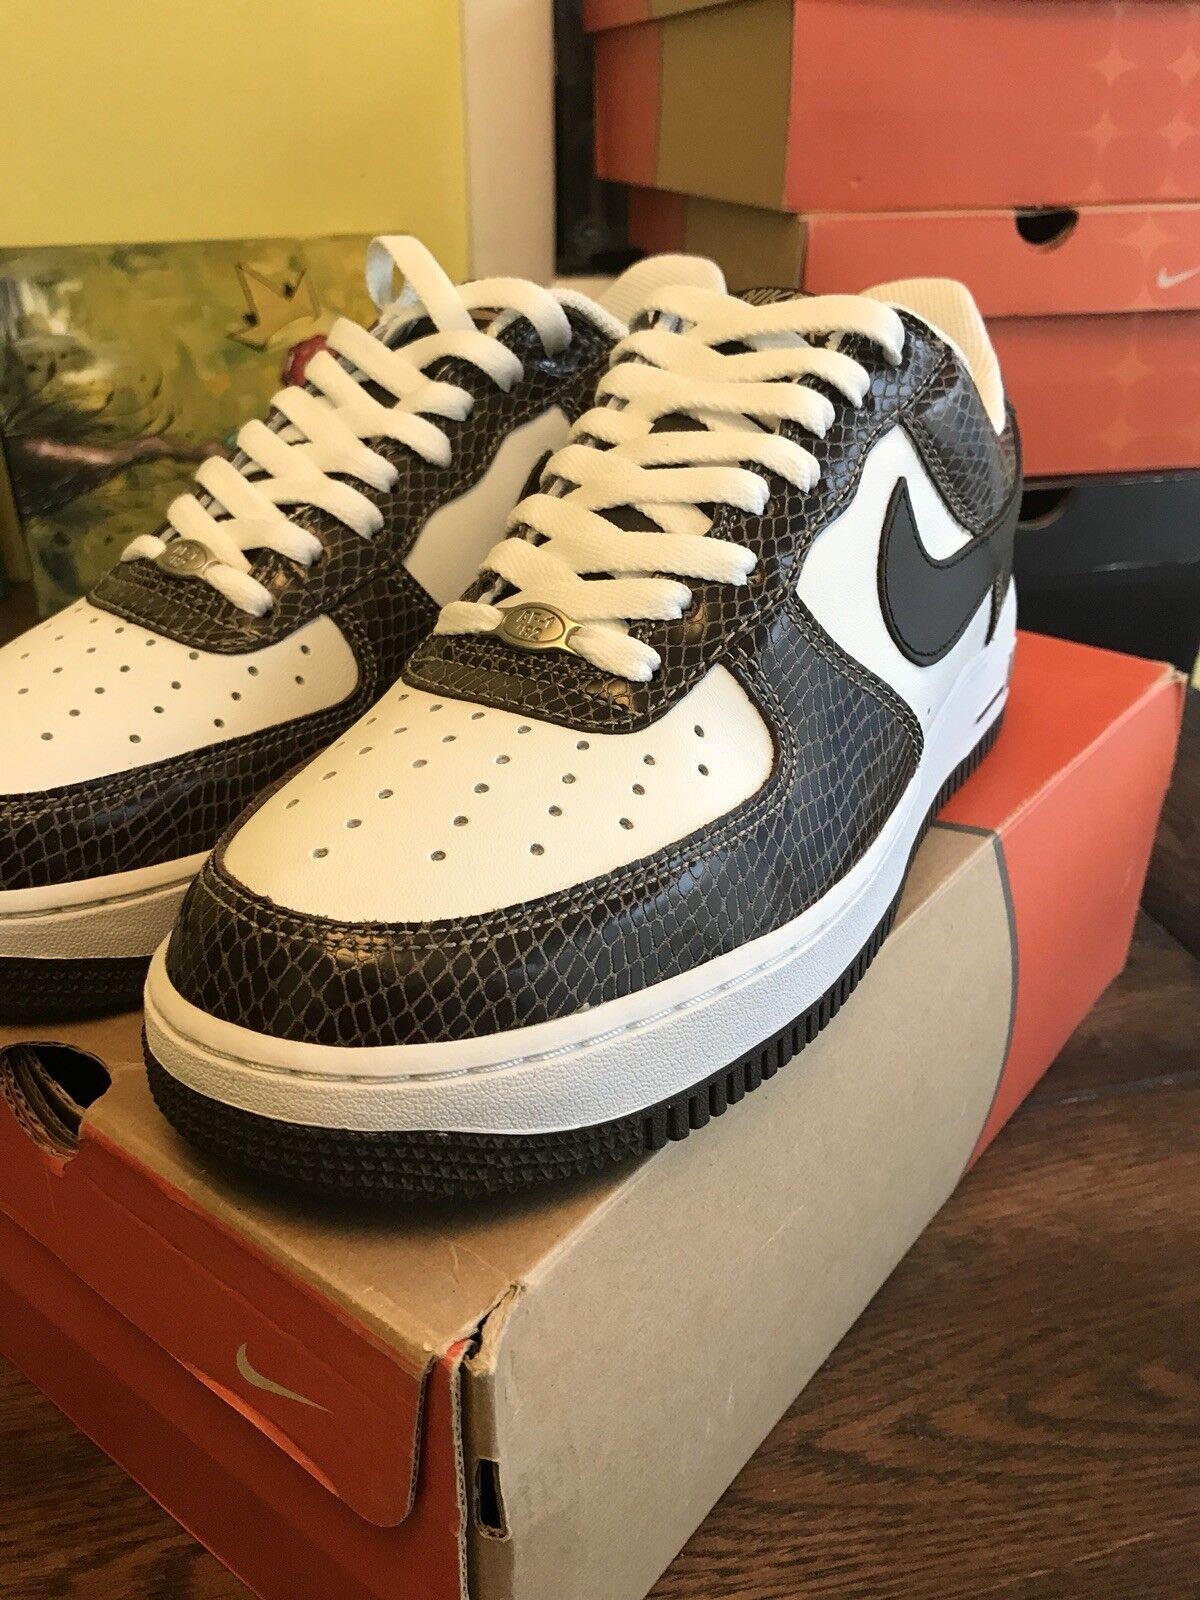 04 Nike Air Force 1 Premium Snakeskin